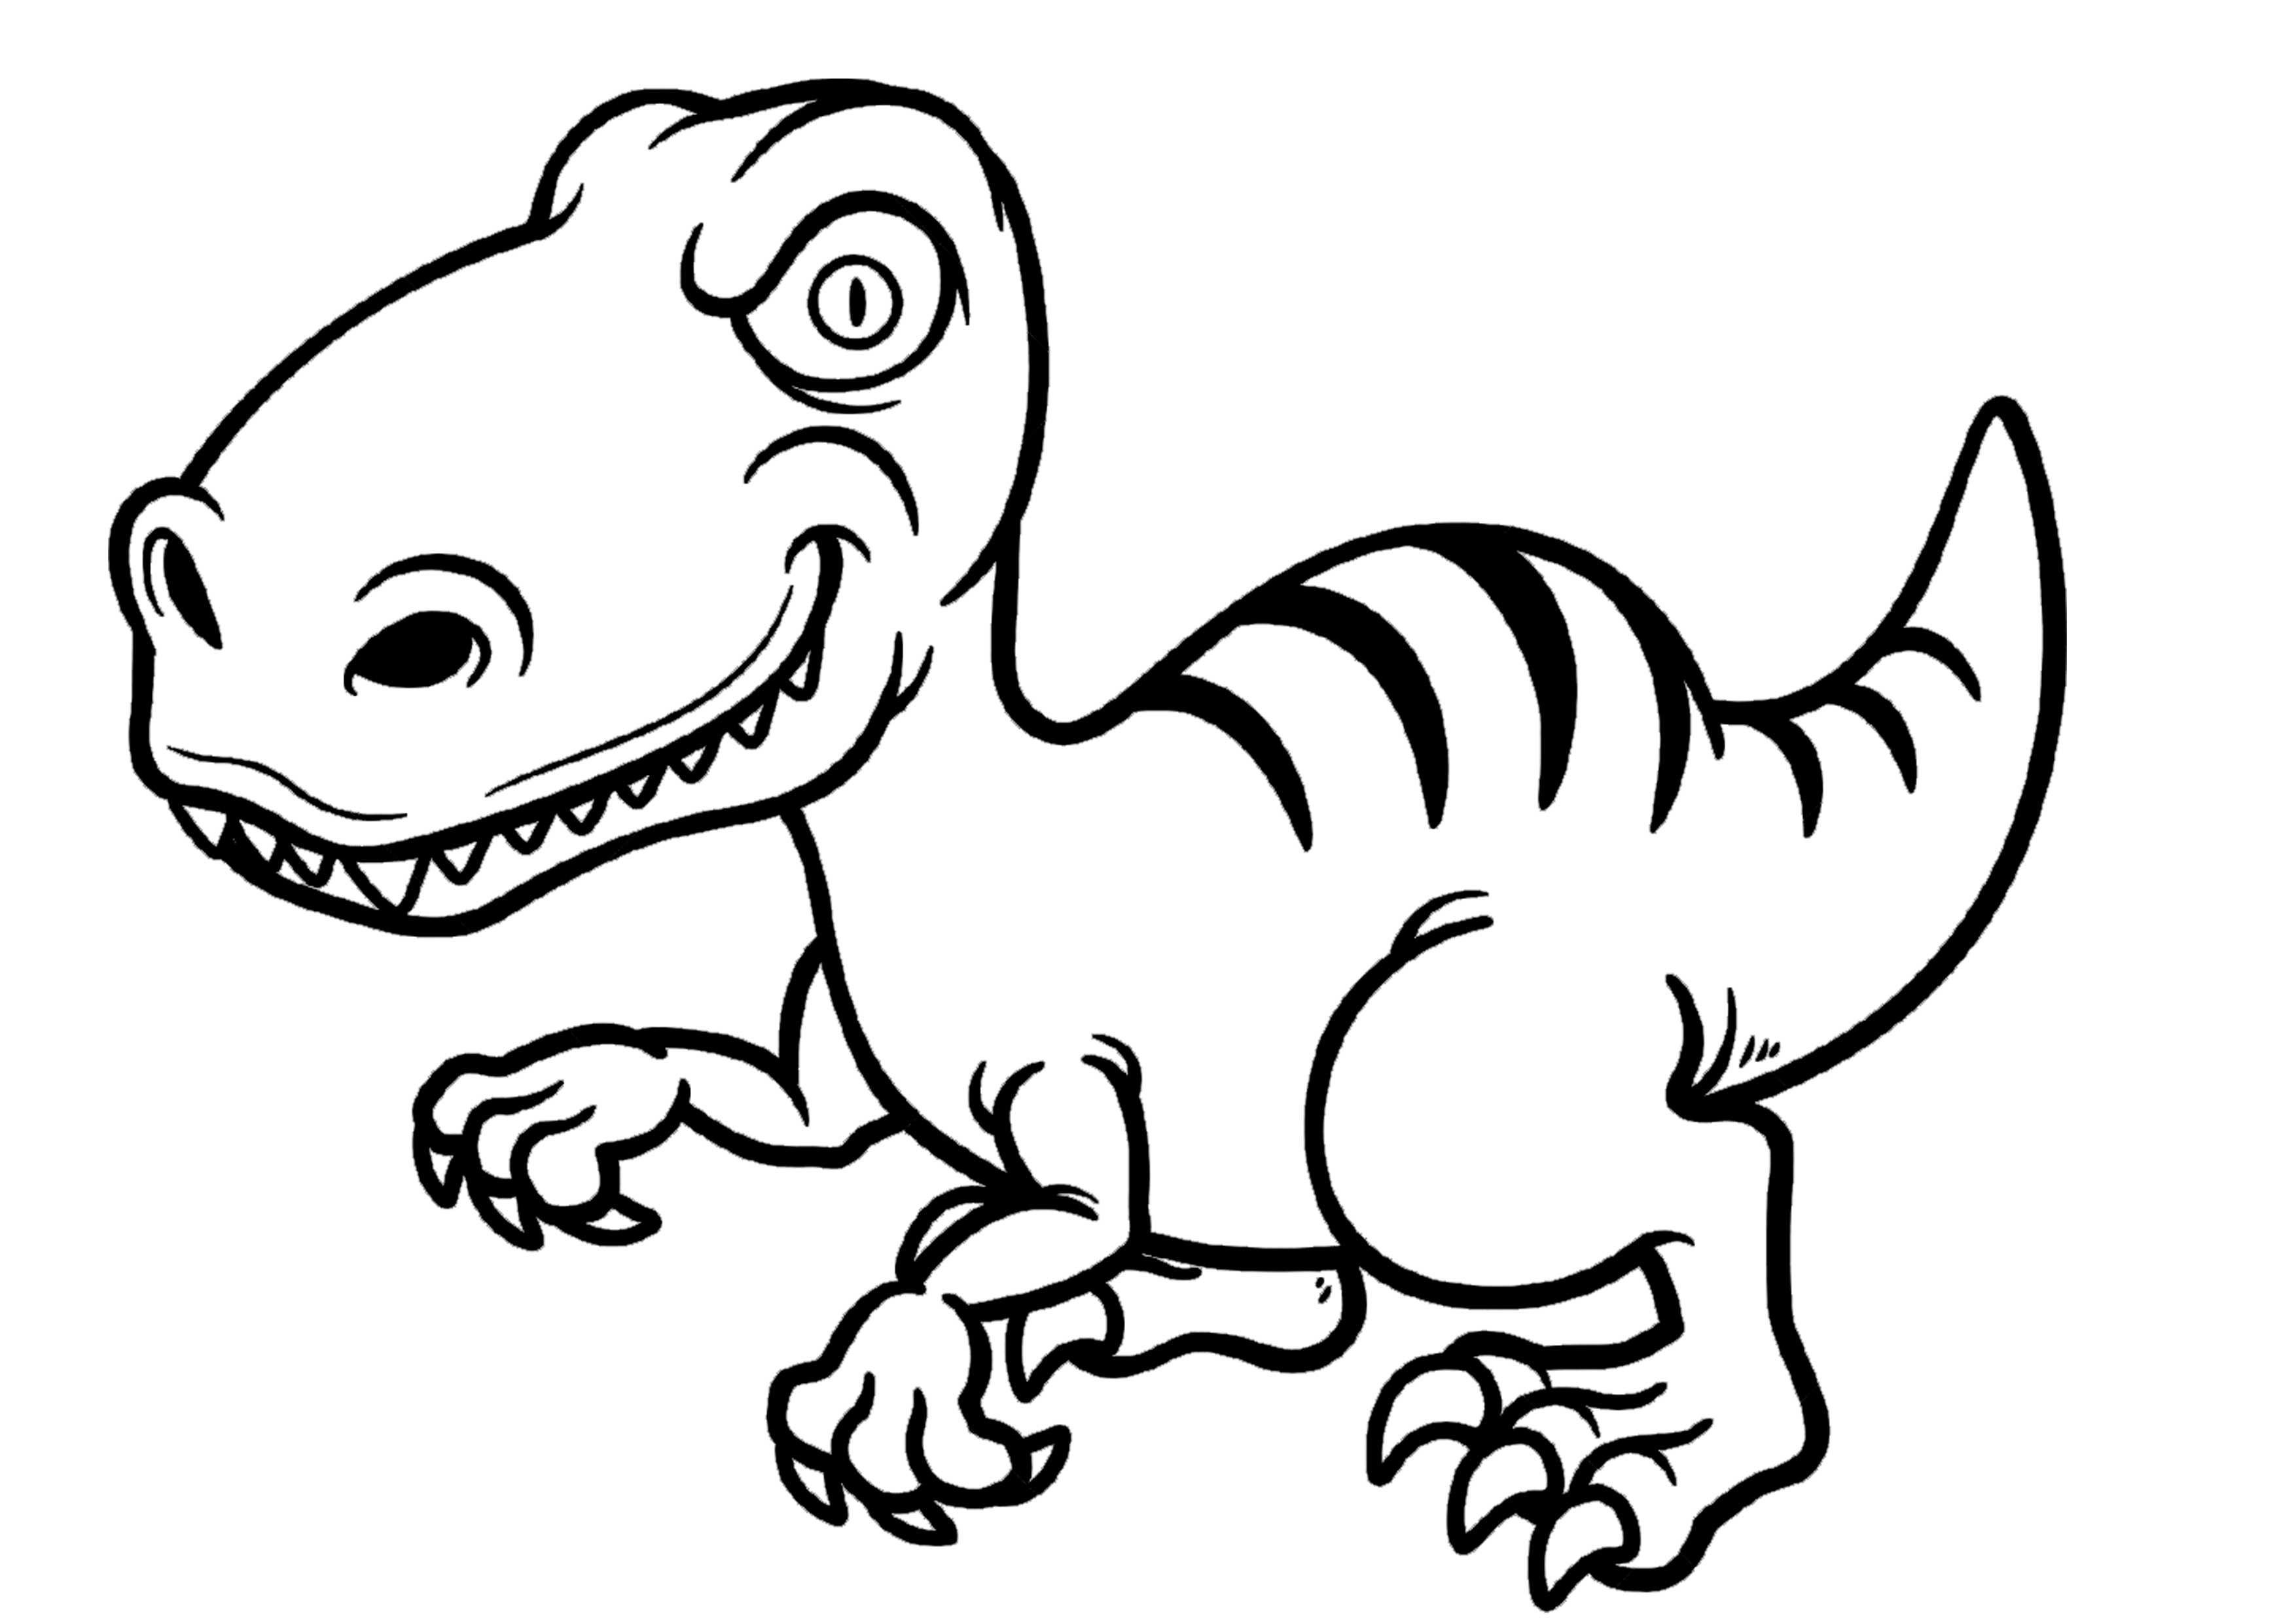 Dibujos Infantiles De Dinosaurios Para Colorear: Resultado De Imagen De Dinosaurios Para Colorear